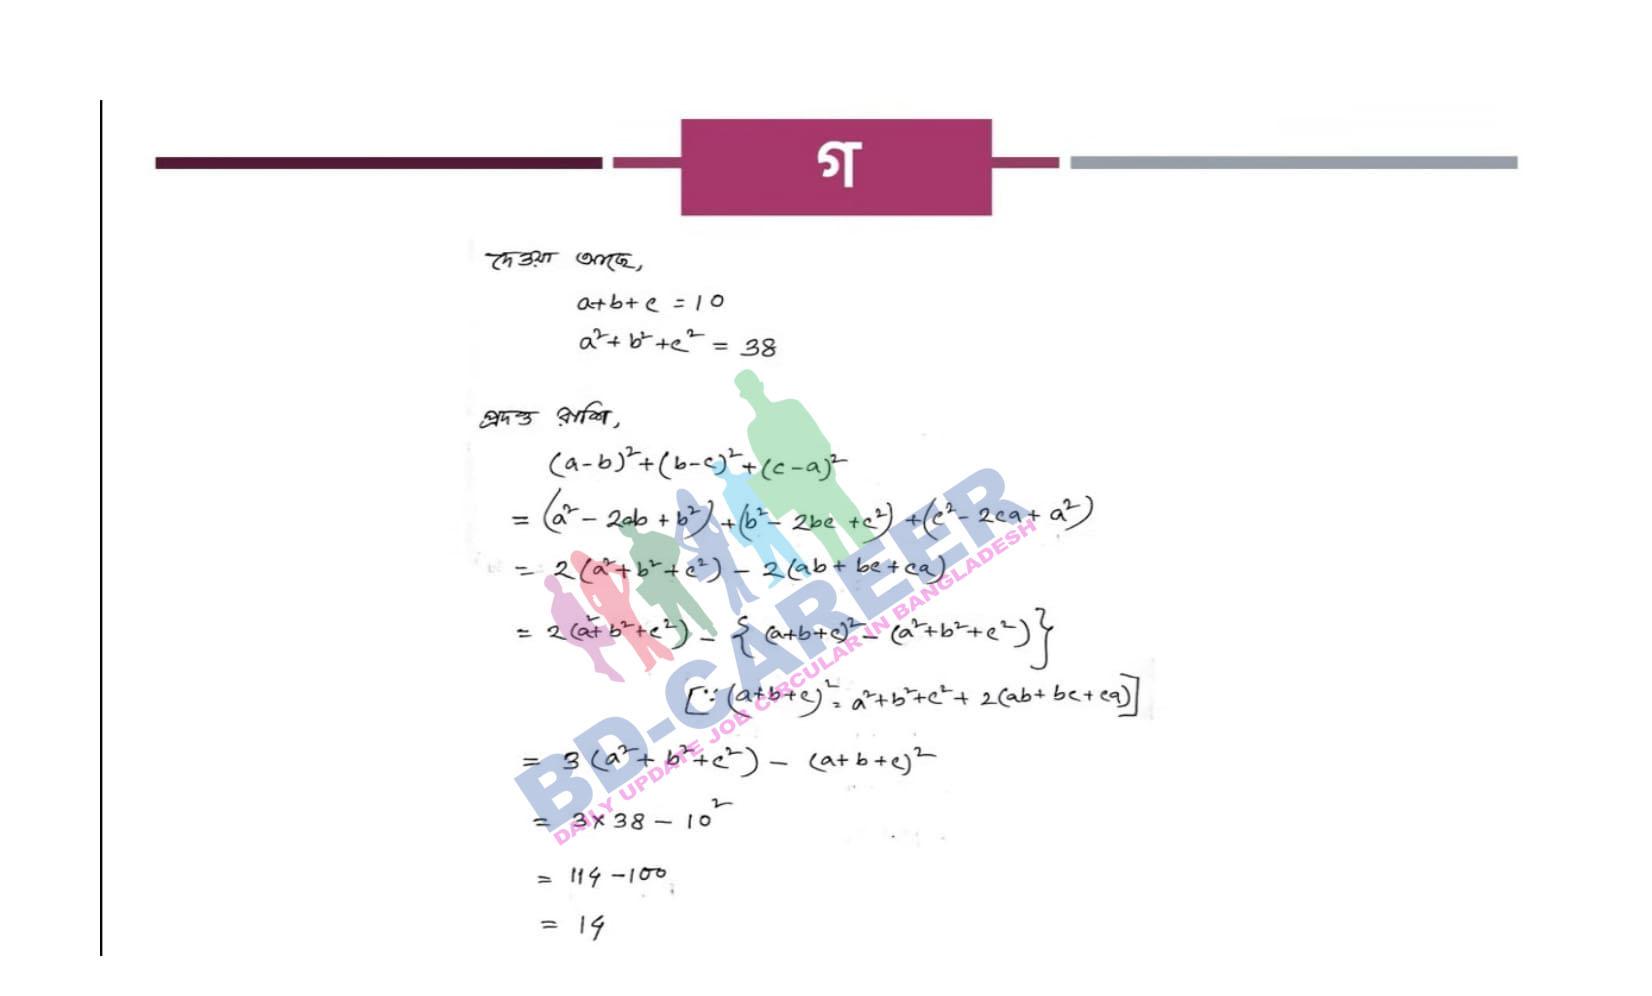 assigment-4th-class-9-math-answer-2020-23